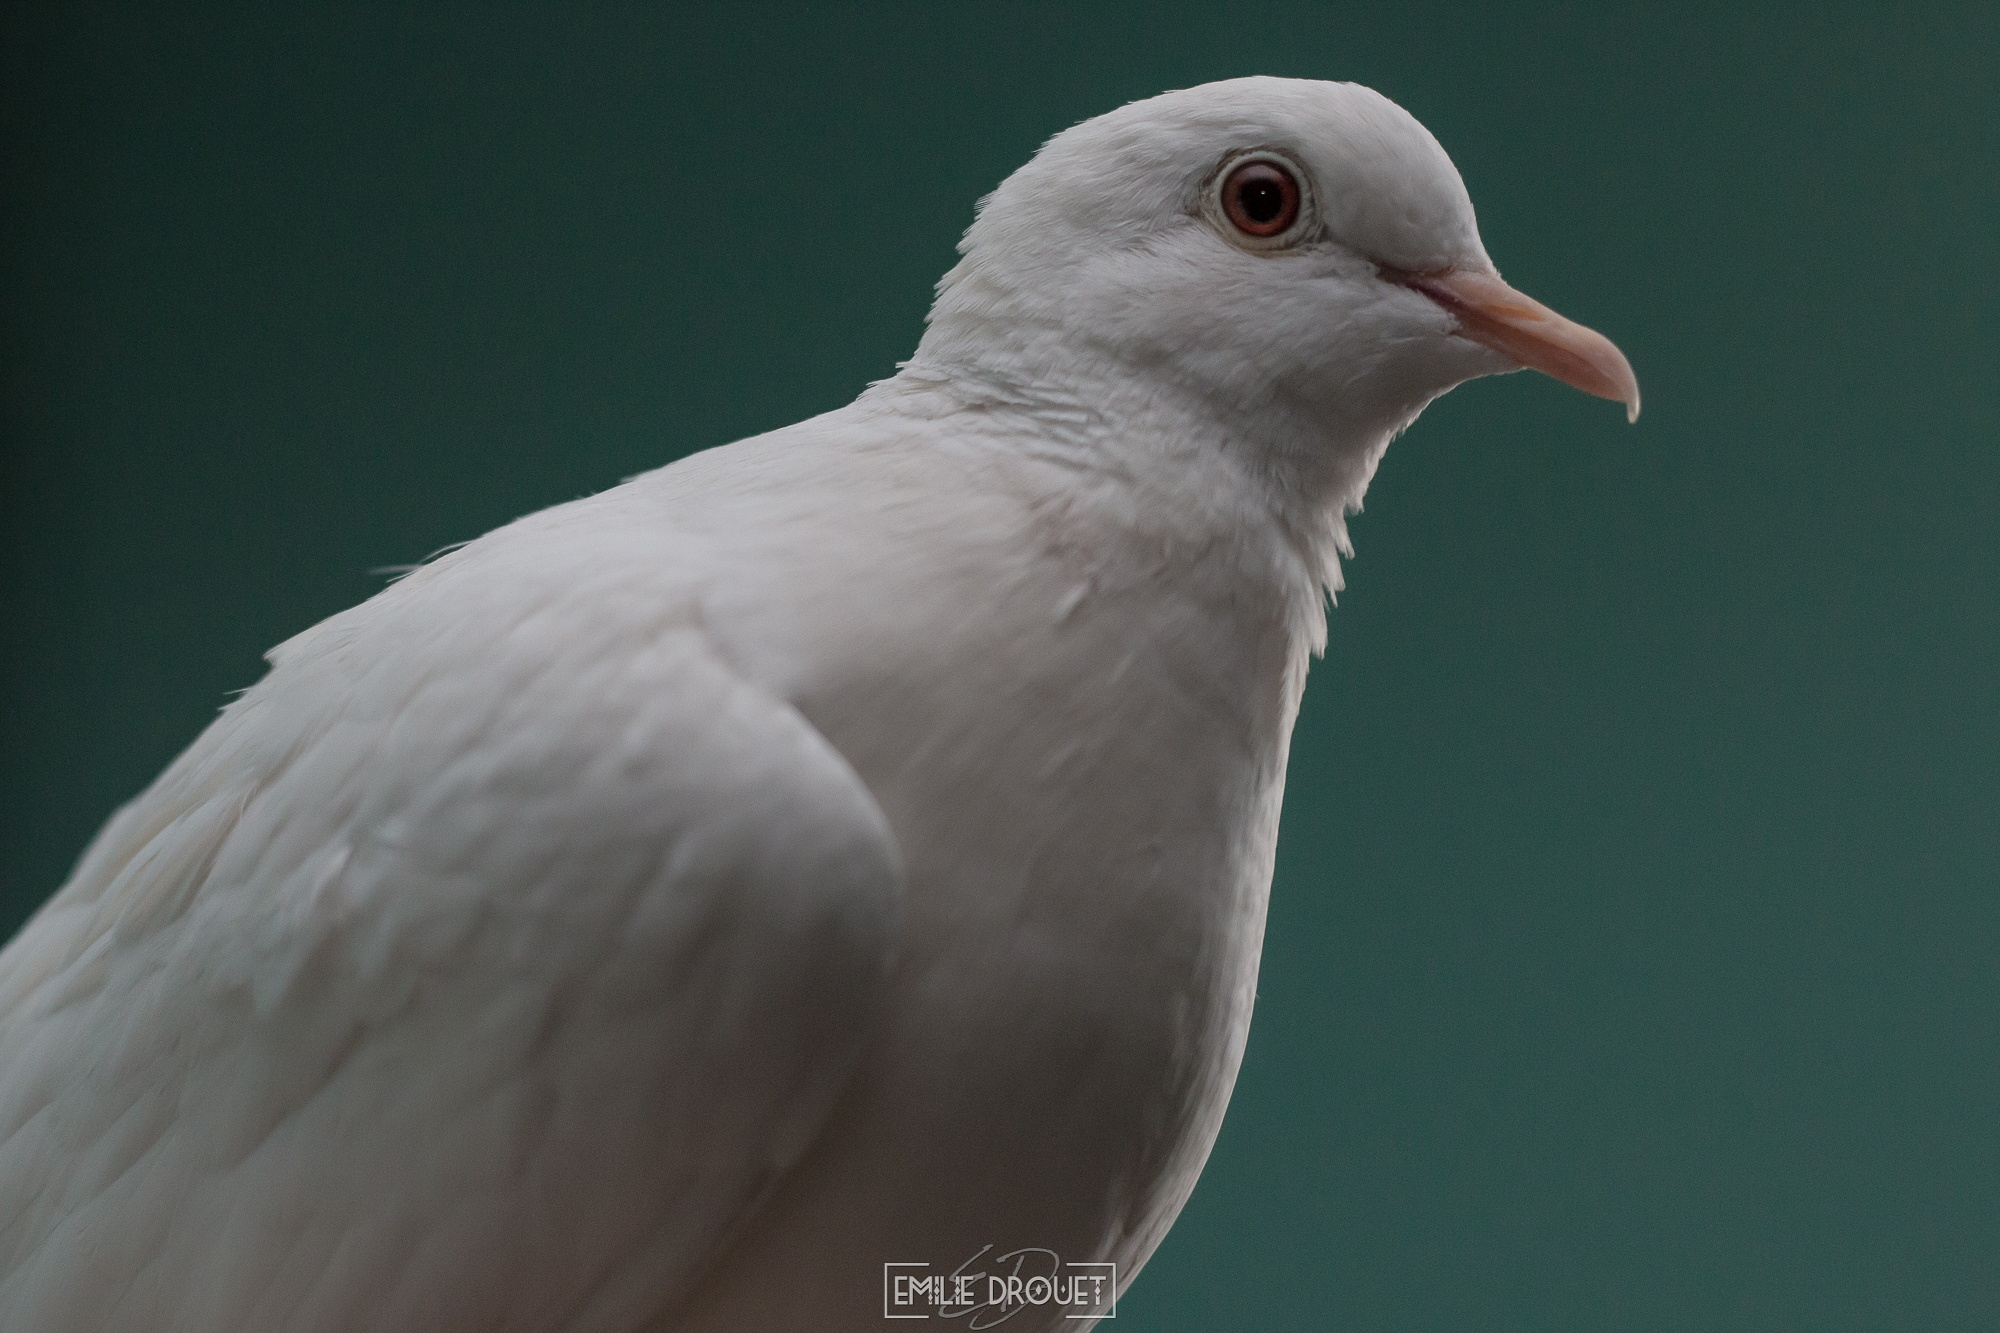 White dove by Emilie Drouet